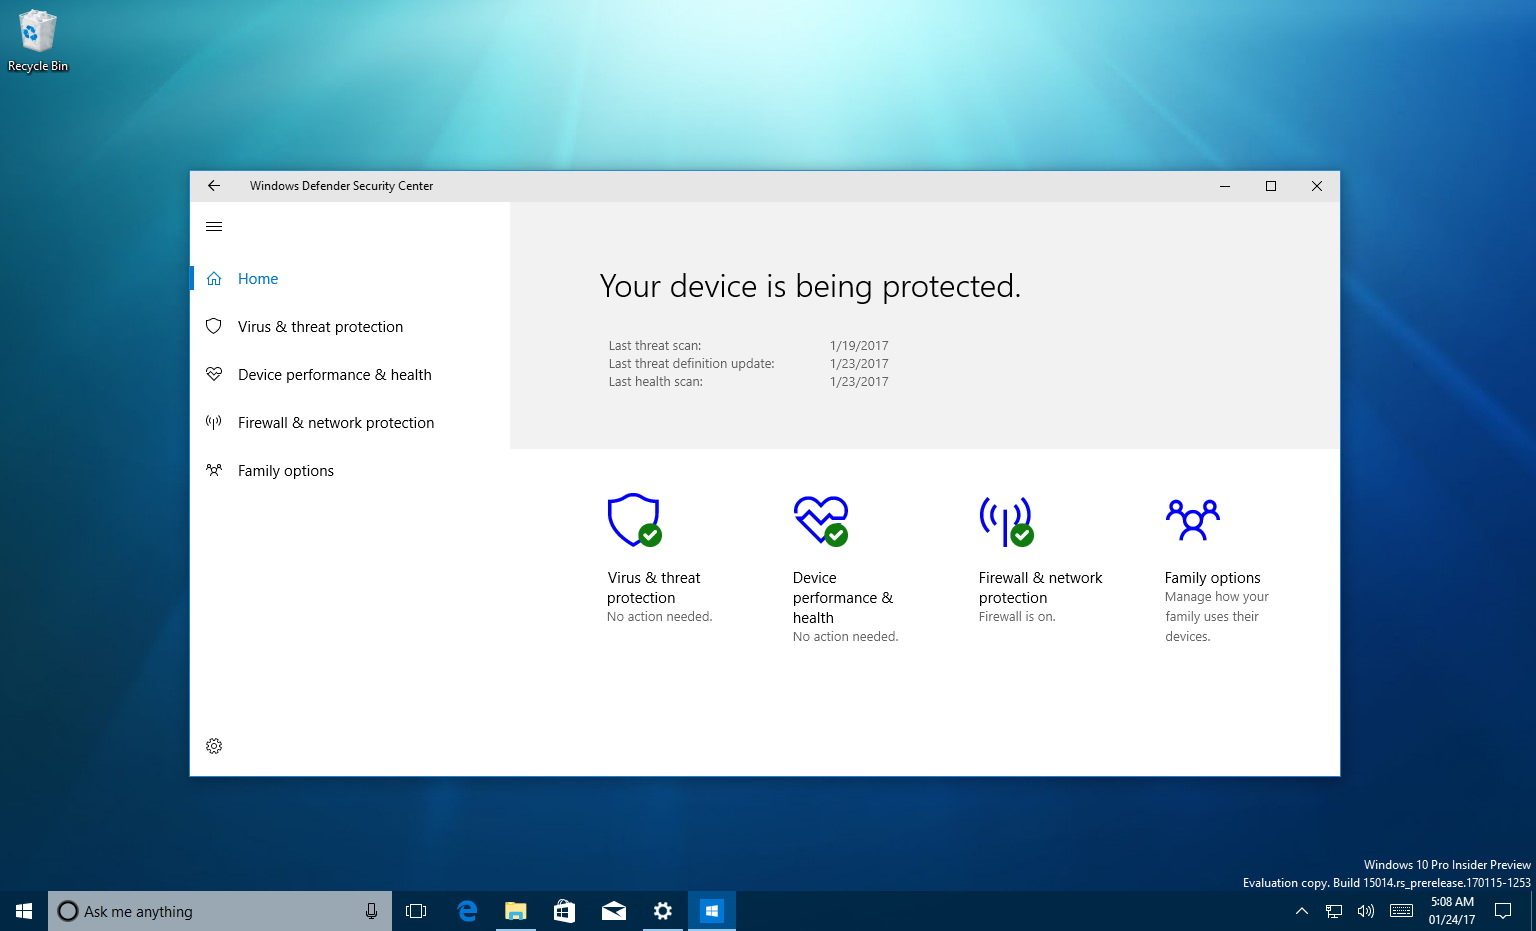 Windows Defender Security Center ¿Adiós al antivirus externo